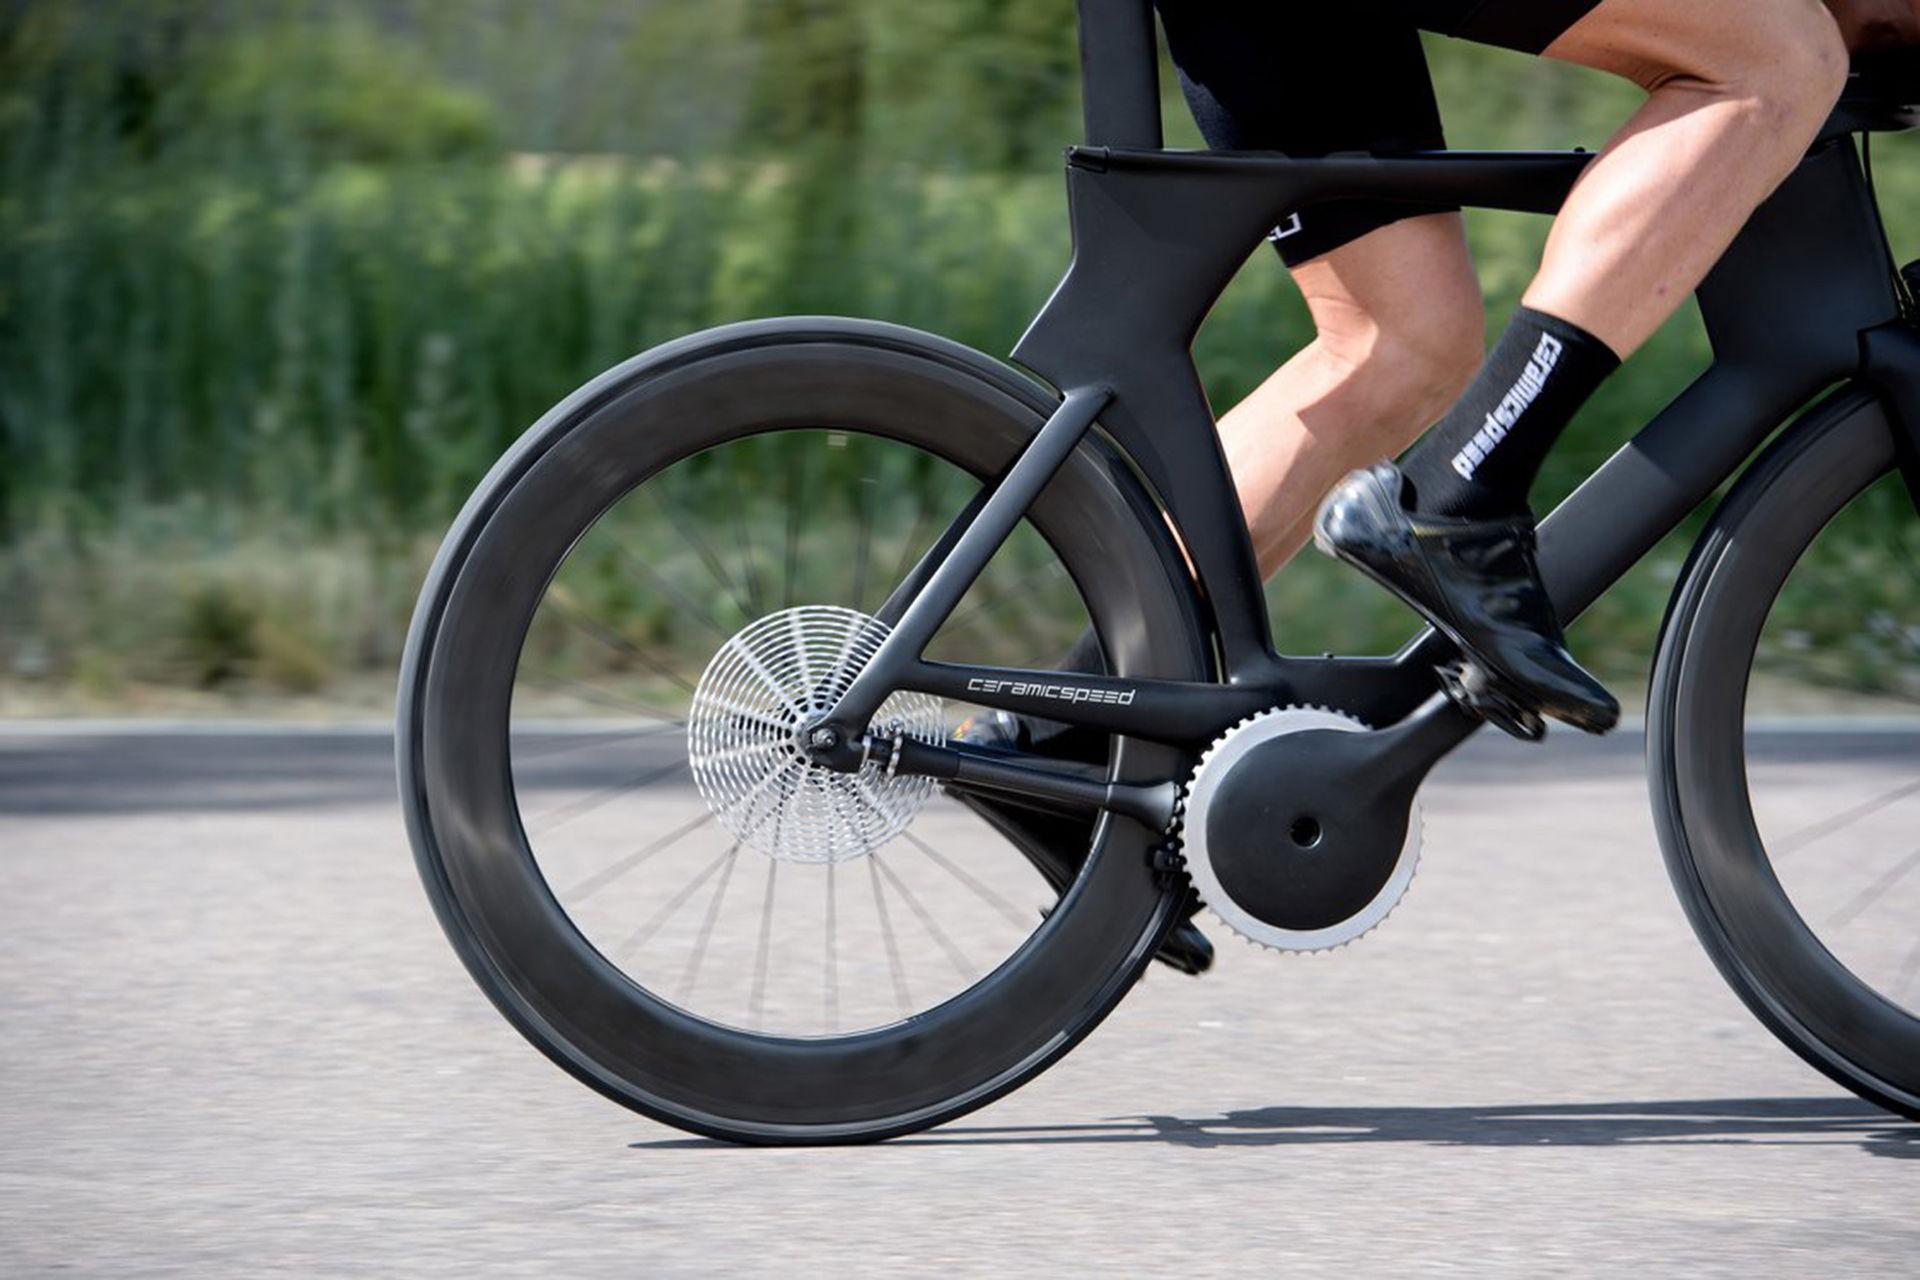 Intressant drivlina till cykel